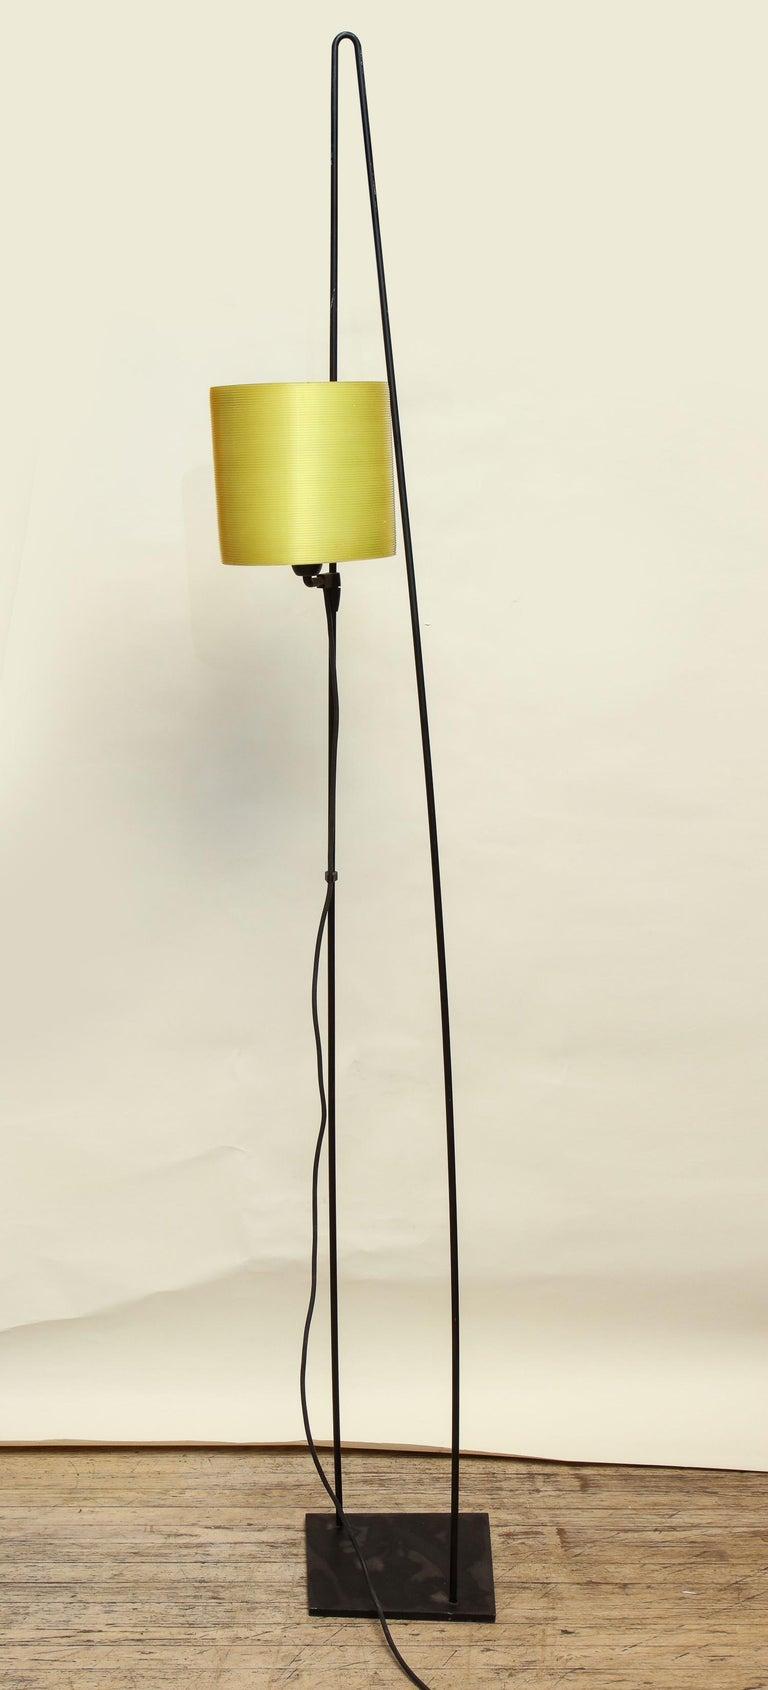 Molded Italiana Luce Floor Lamp Mid-Century Modern Ion and Plexiglass, Italy, 1970 For Sale